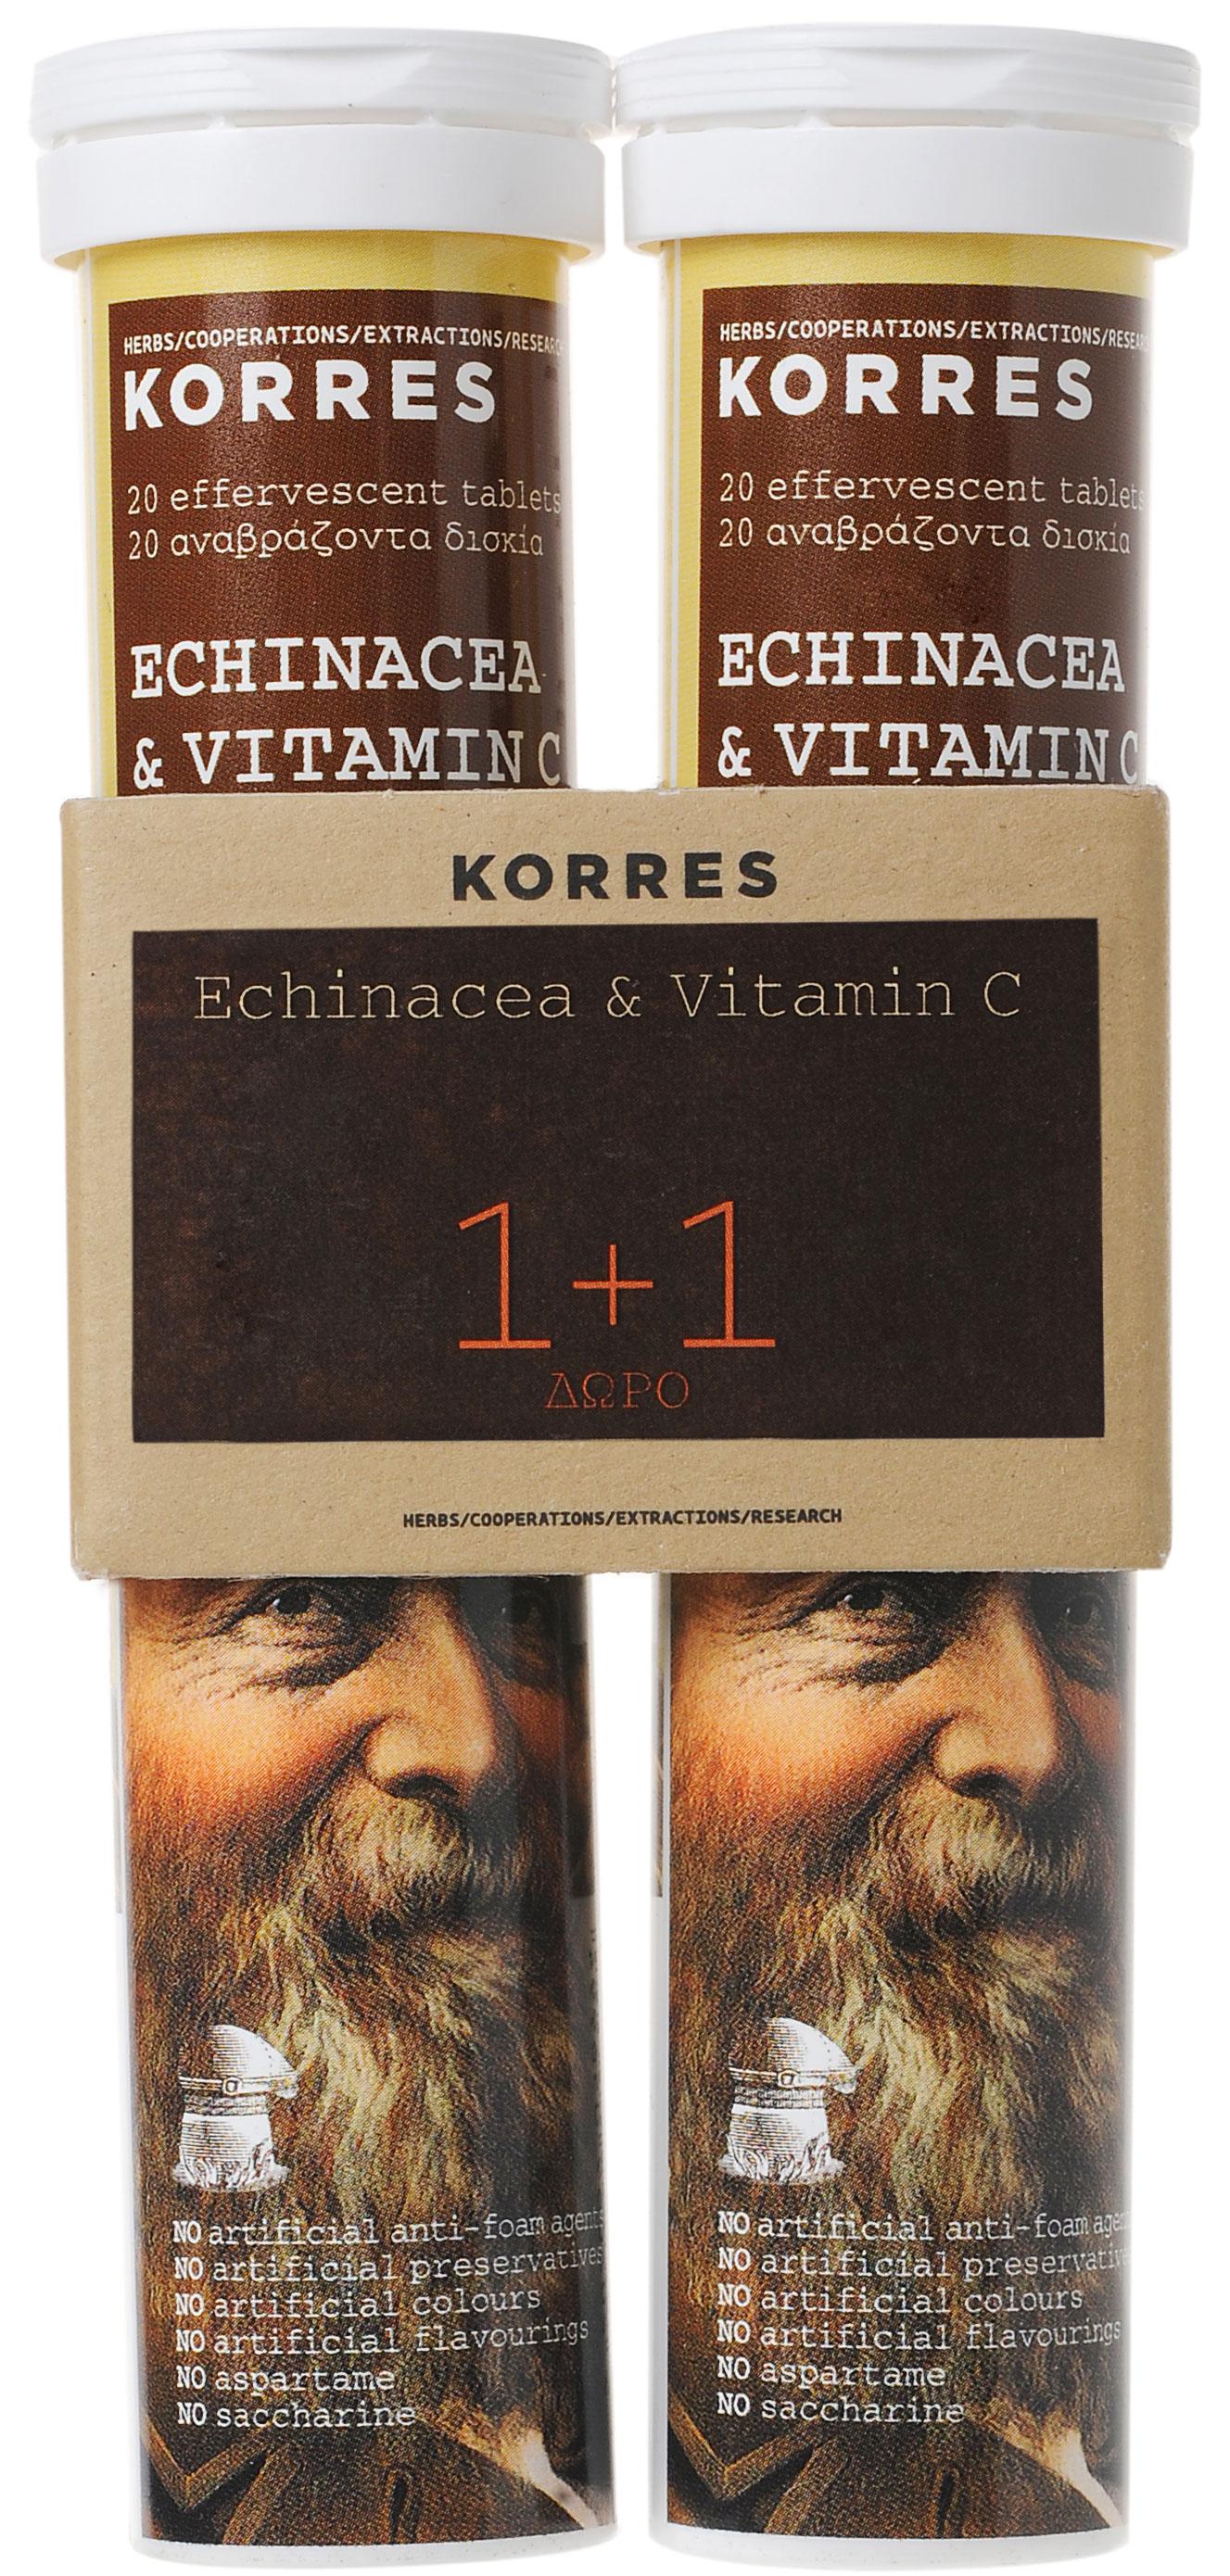 Korres Echinacea & Βιταμίνη C Γεύση Λεμόνι, 2x18 Αναβράζοντα Δισκία